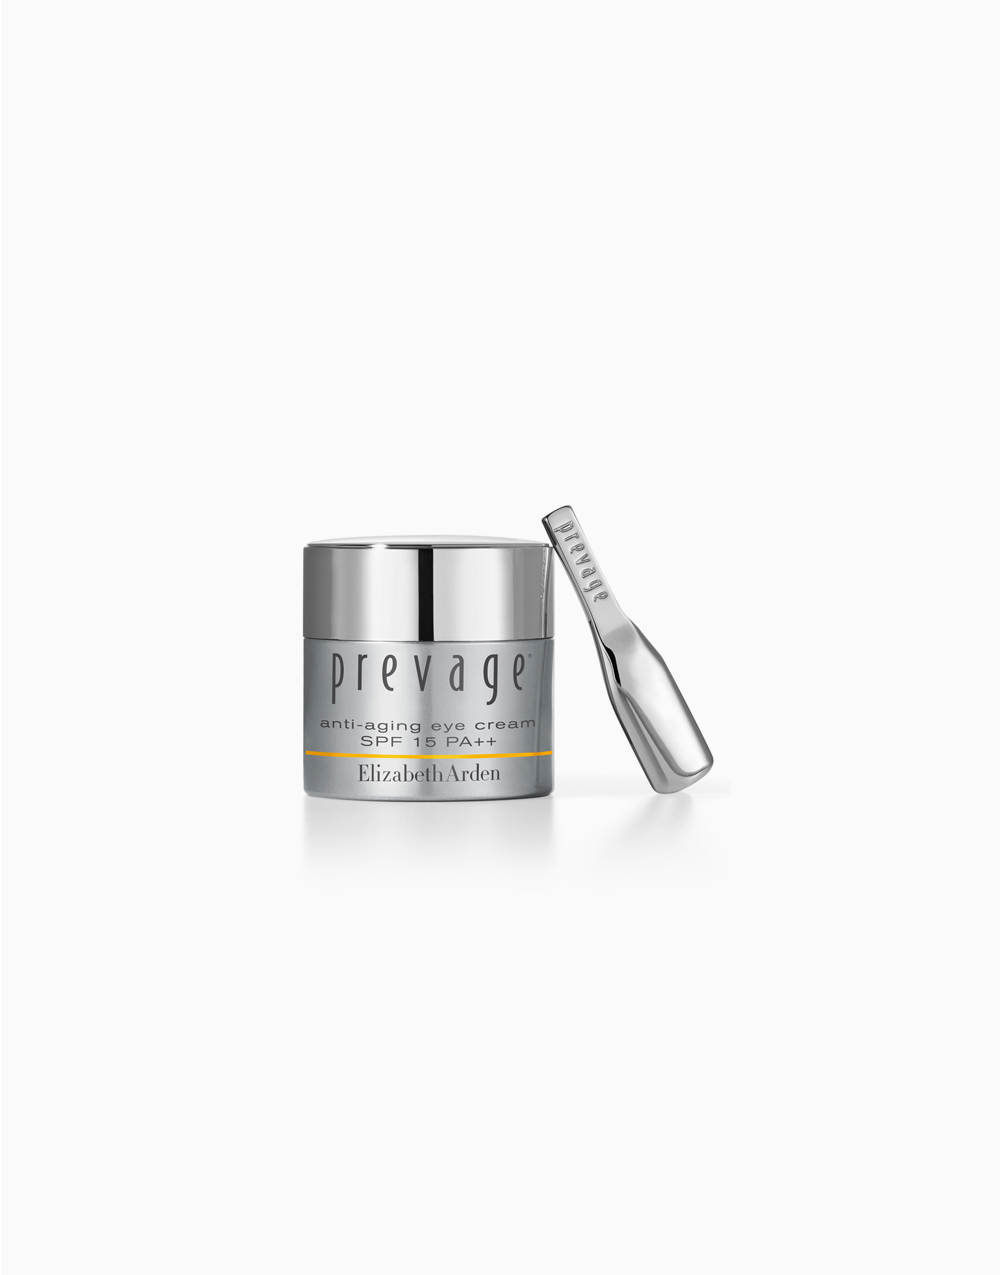 Prevage Anti-aging Eye Cream Sunscreen SPF 15 (15ml) by Elizabeth Arden